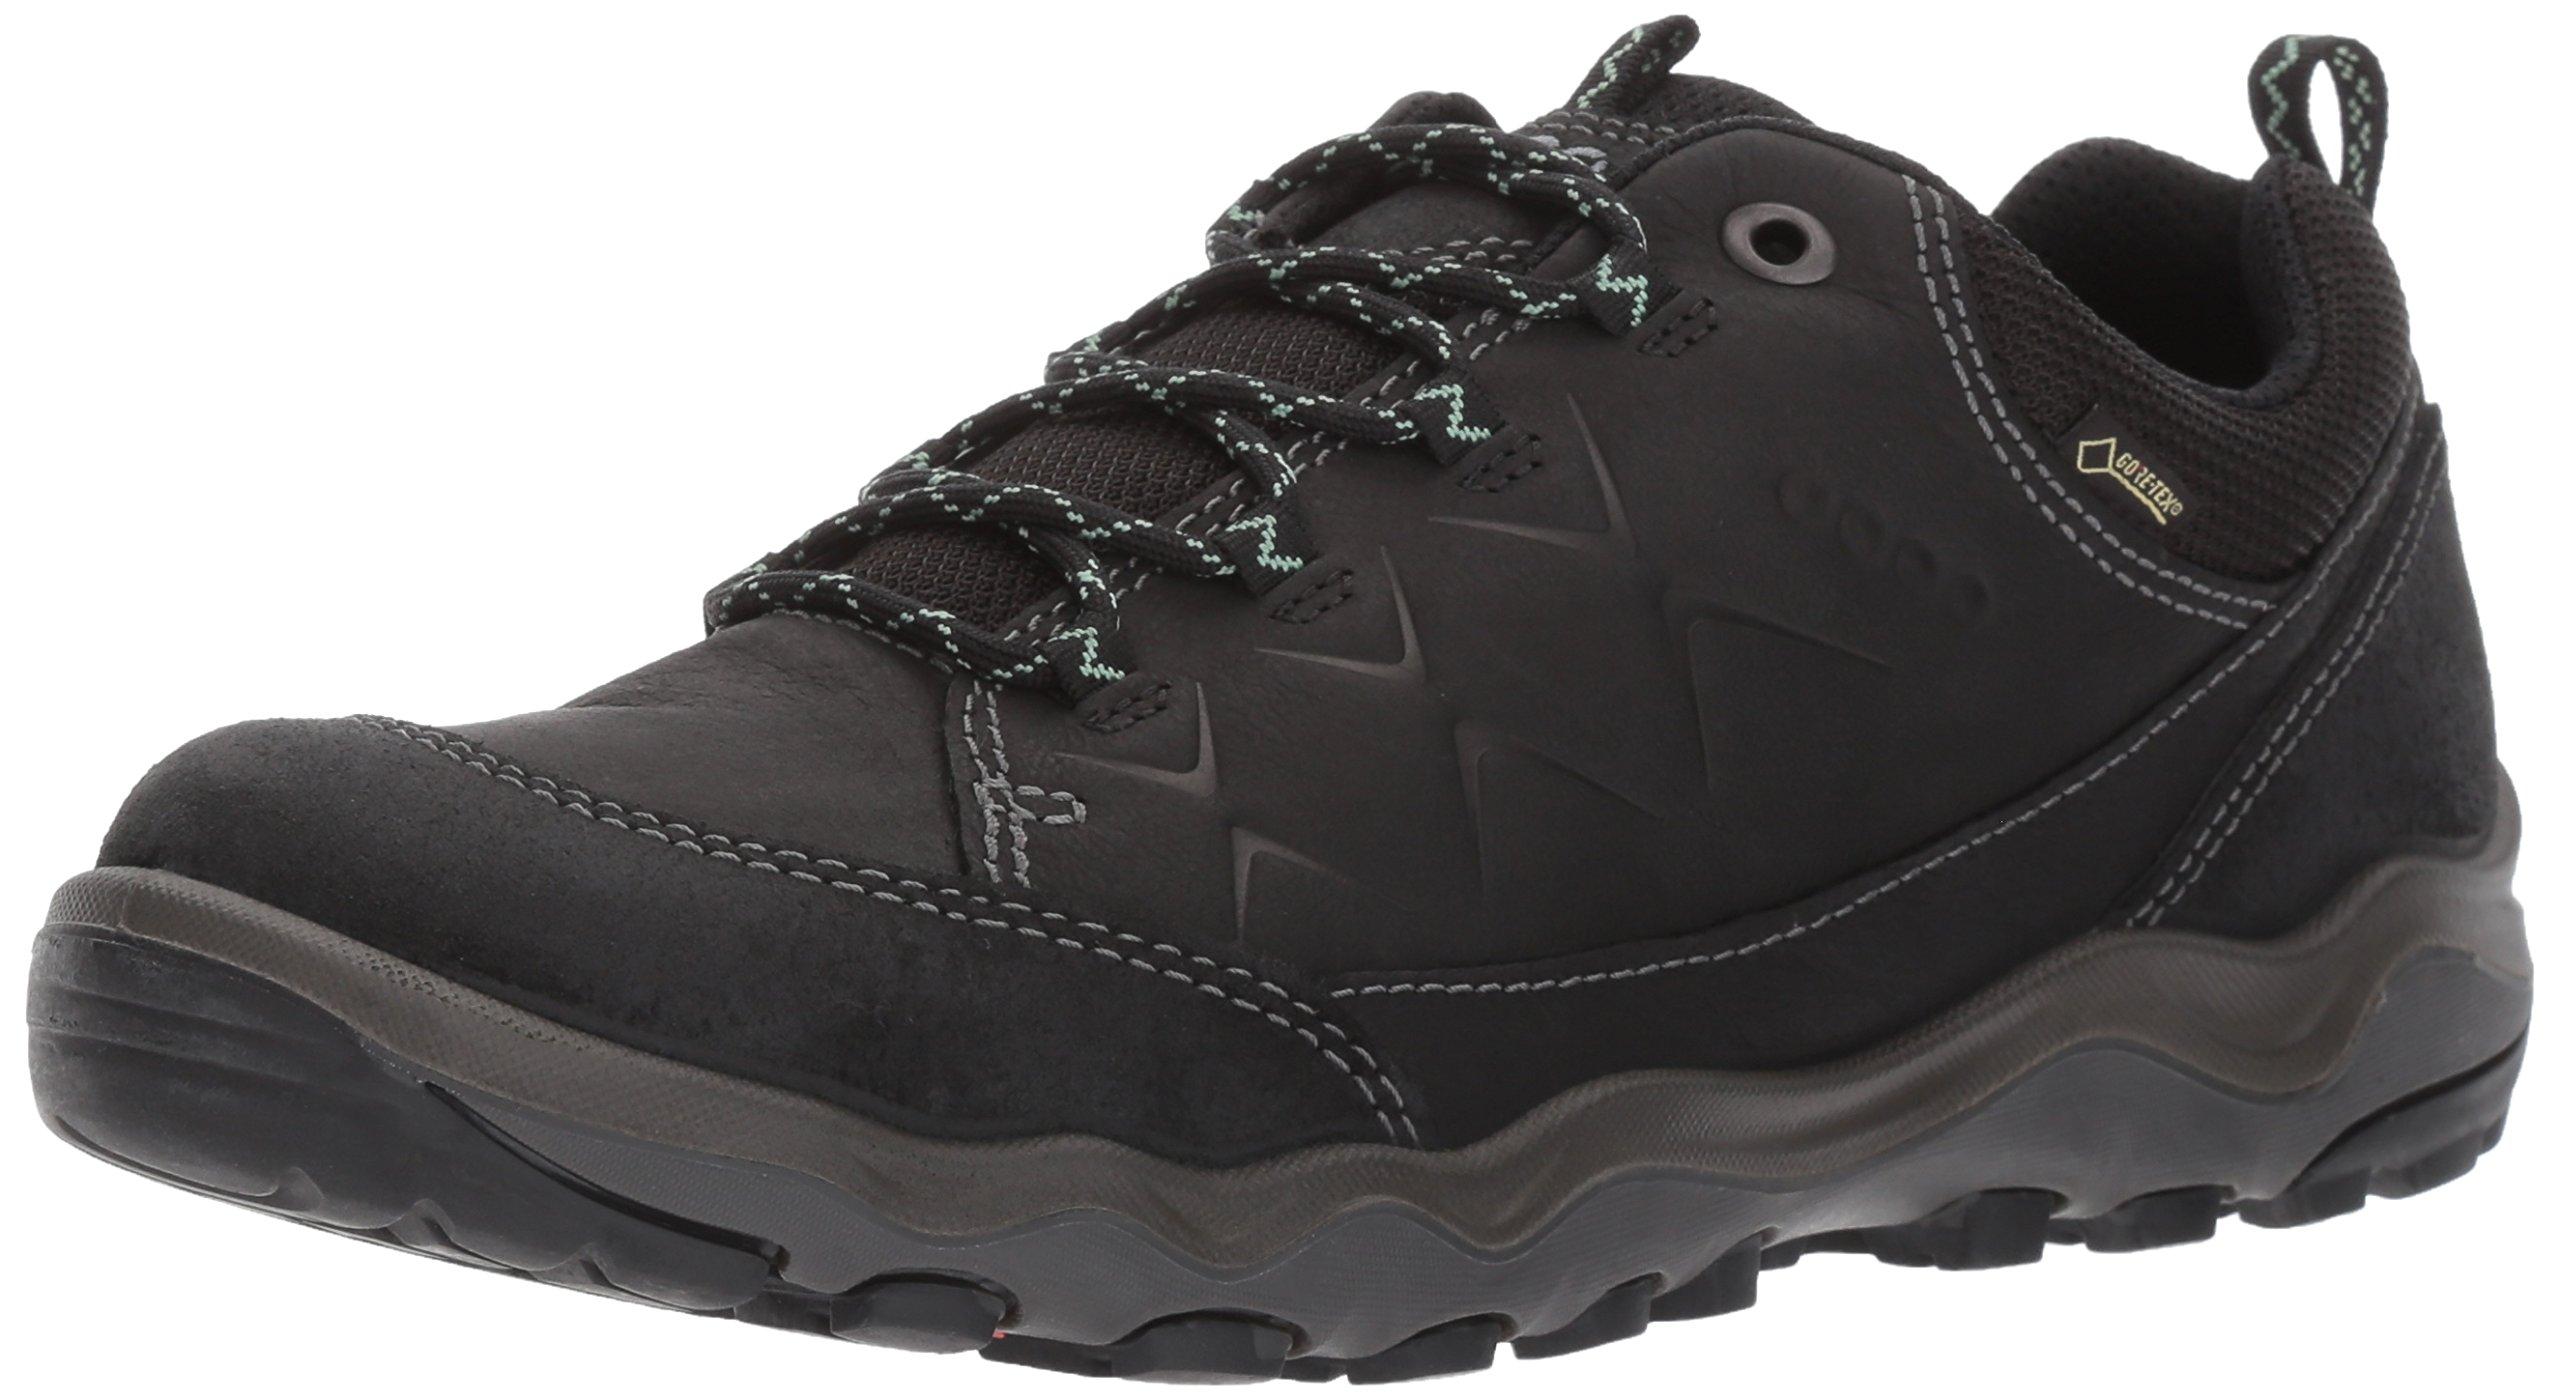 ECCO Women's Ulterra Low Gore-Tex Hiking Shoe, Black/Black, 40 EU / 9-9.5 US